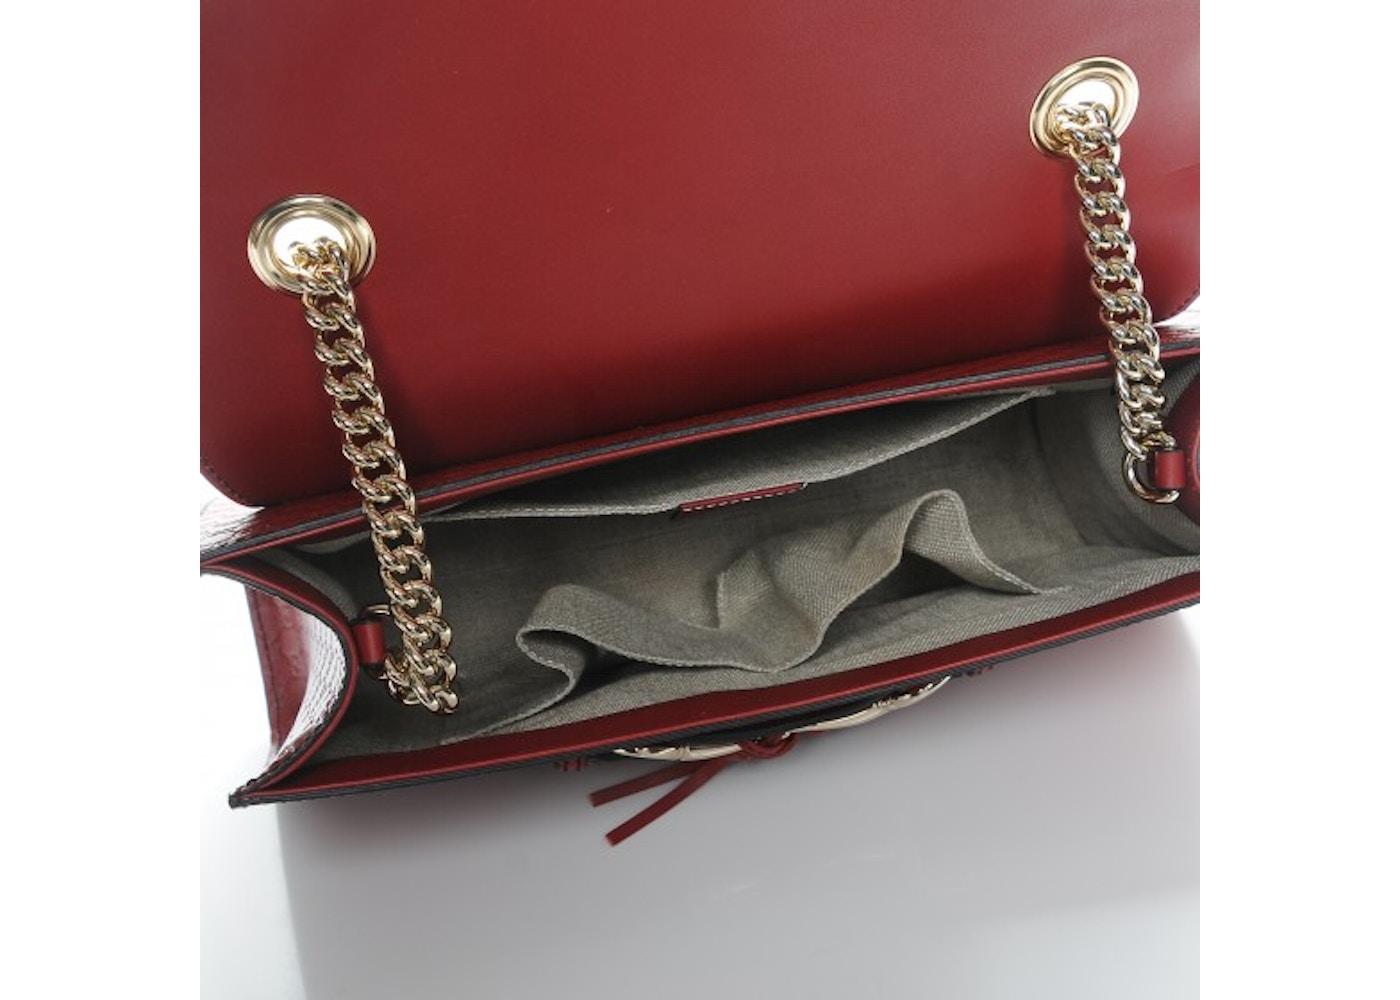 eb694b1d4c68 Gucci Emily Shoulder Bag Monogram Microguccissima Medium Red